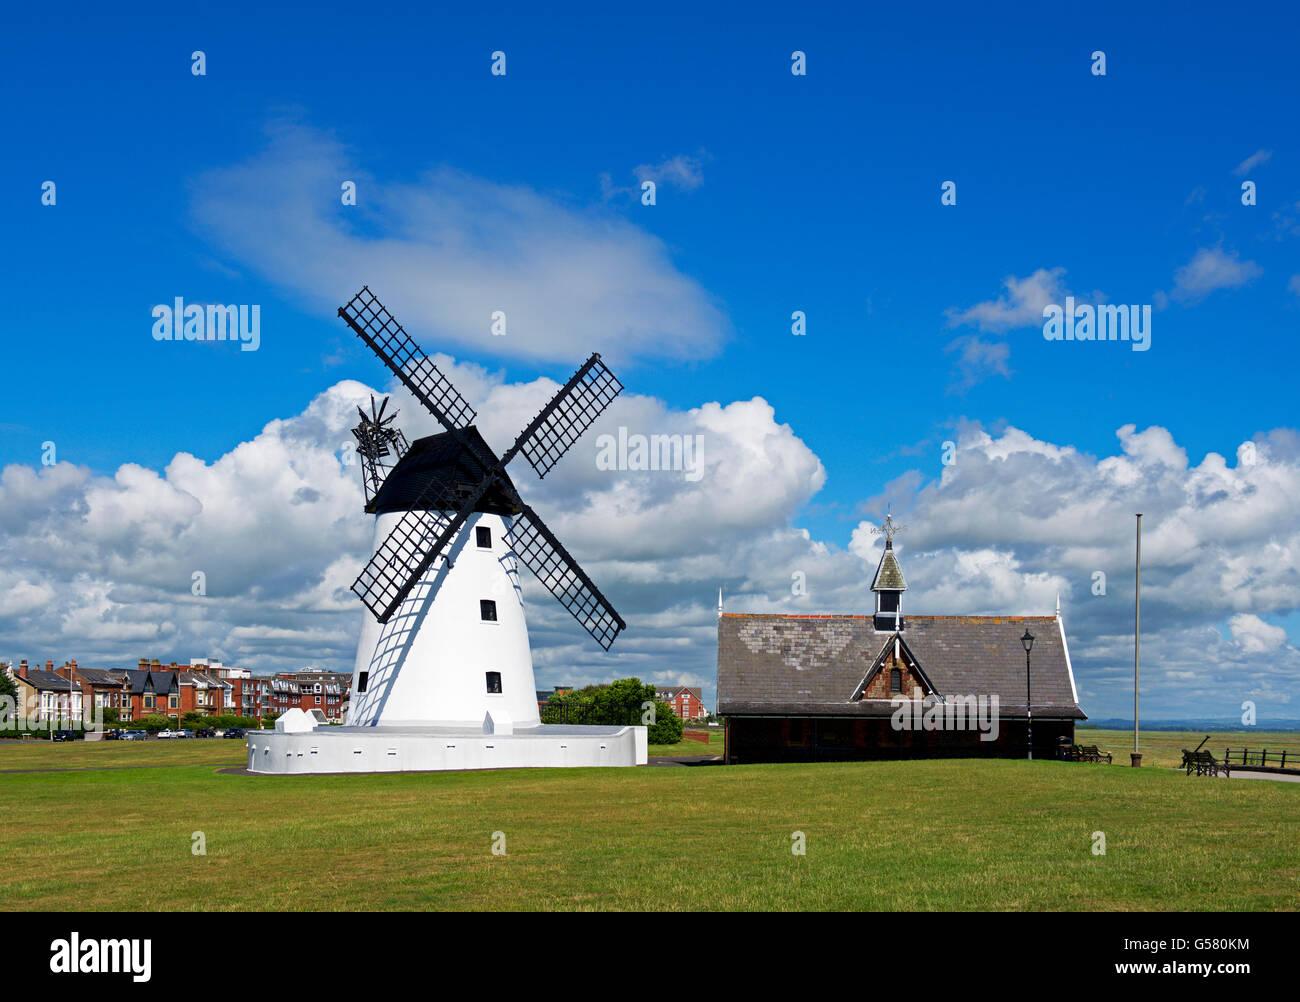 Lytham Windmill, Lytham St Annes, Lancashire, England UK - Stock Image